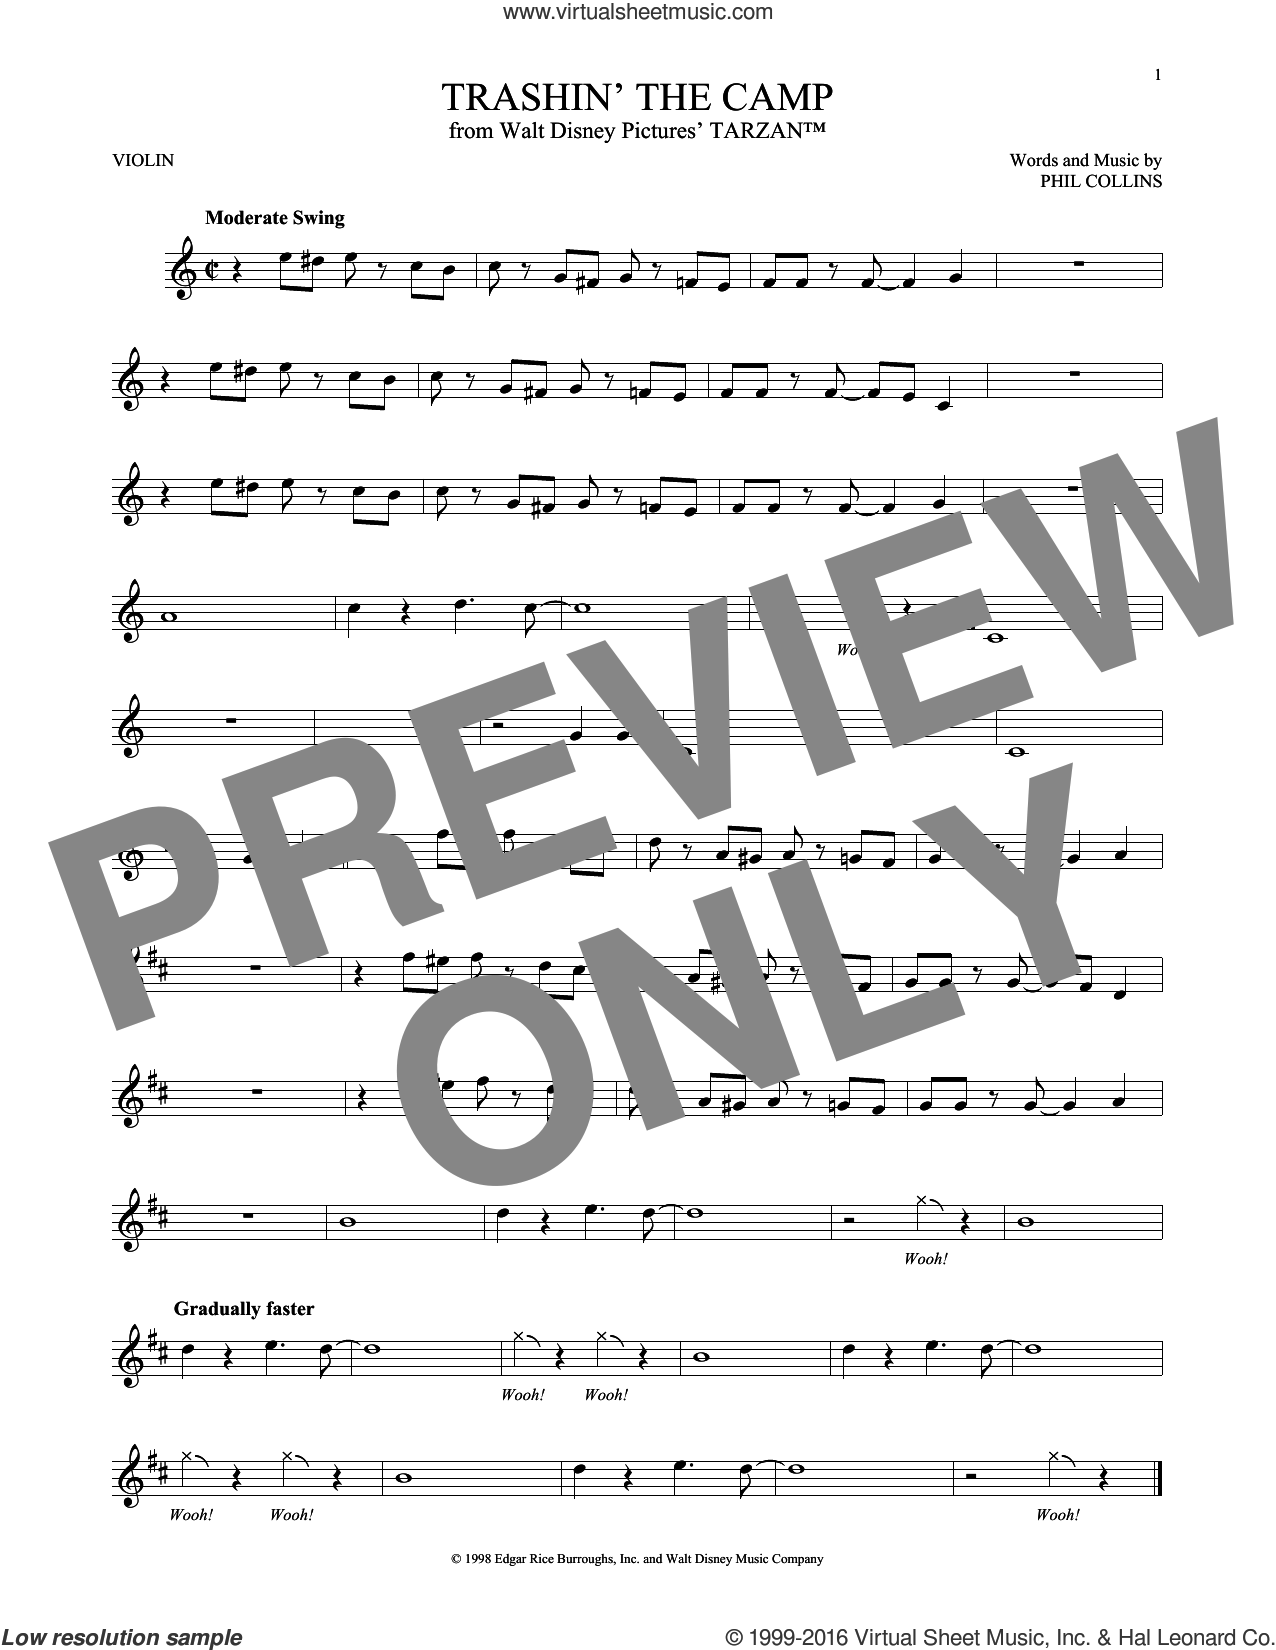 Trashin' The Camp sheet music for violin solo by Phil Collins, intermediate skill level